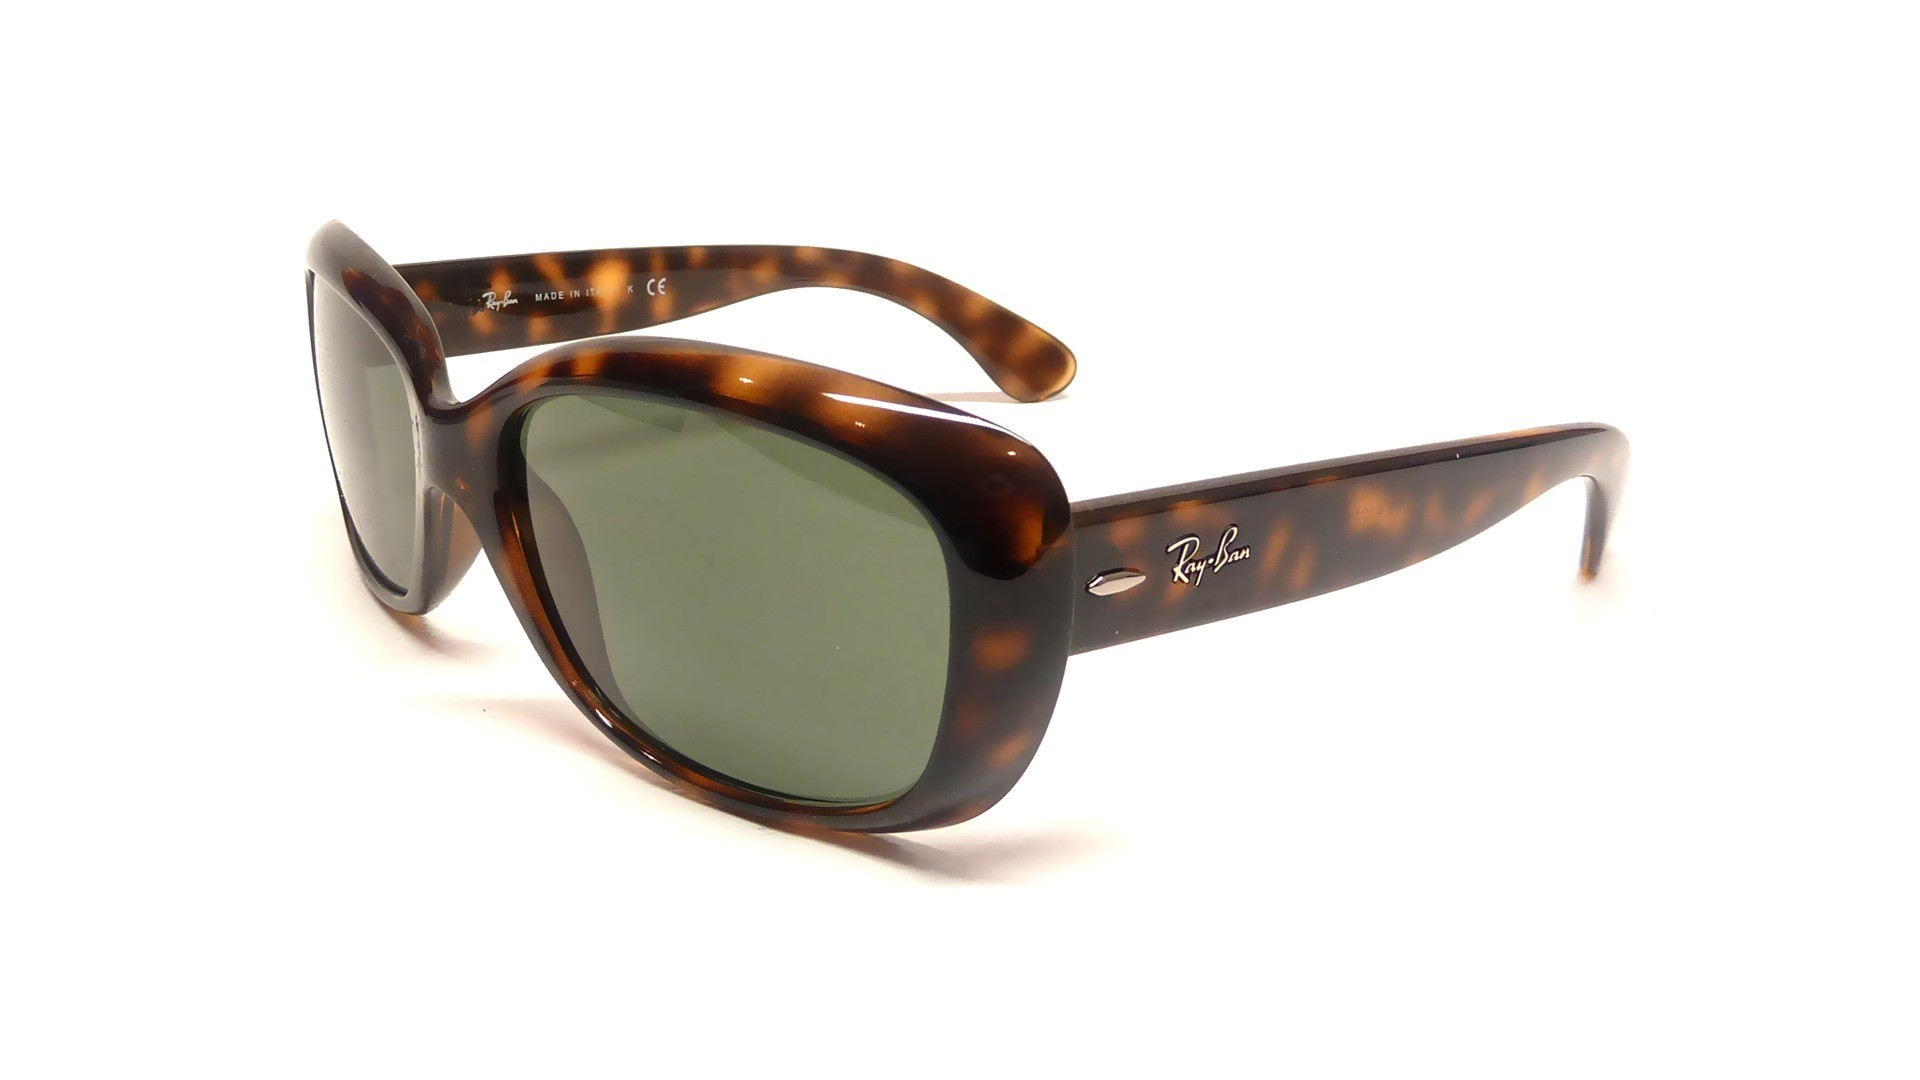 bc9bf977e1b Sunglasses Ray-Ban Jackie Ohh Tortoise RB4101 710 58-17 Large